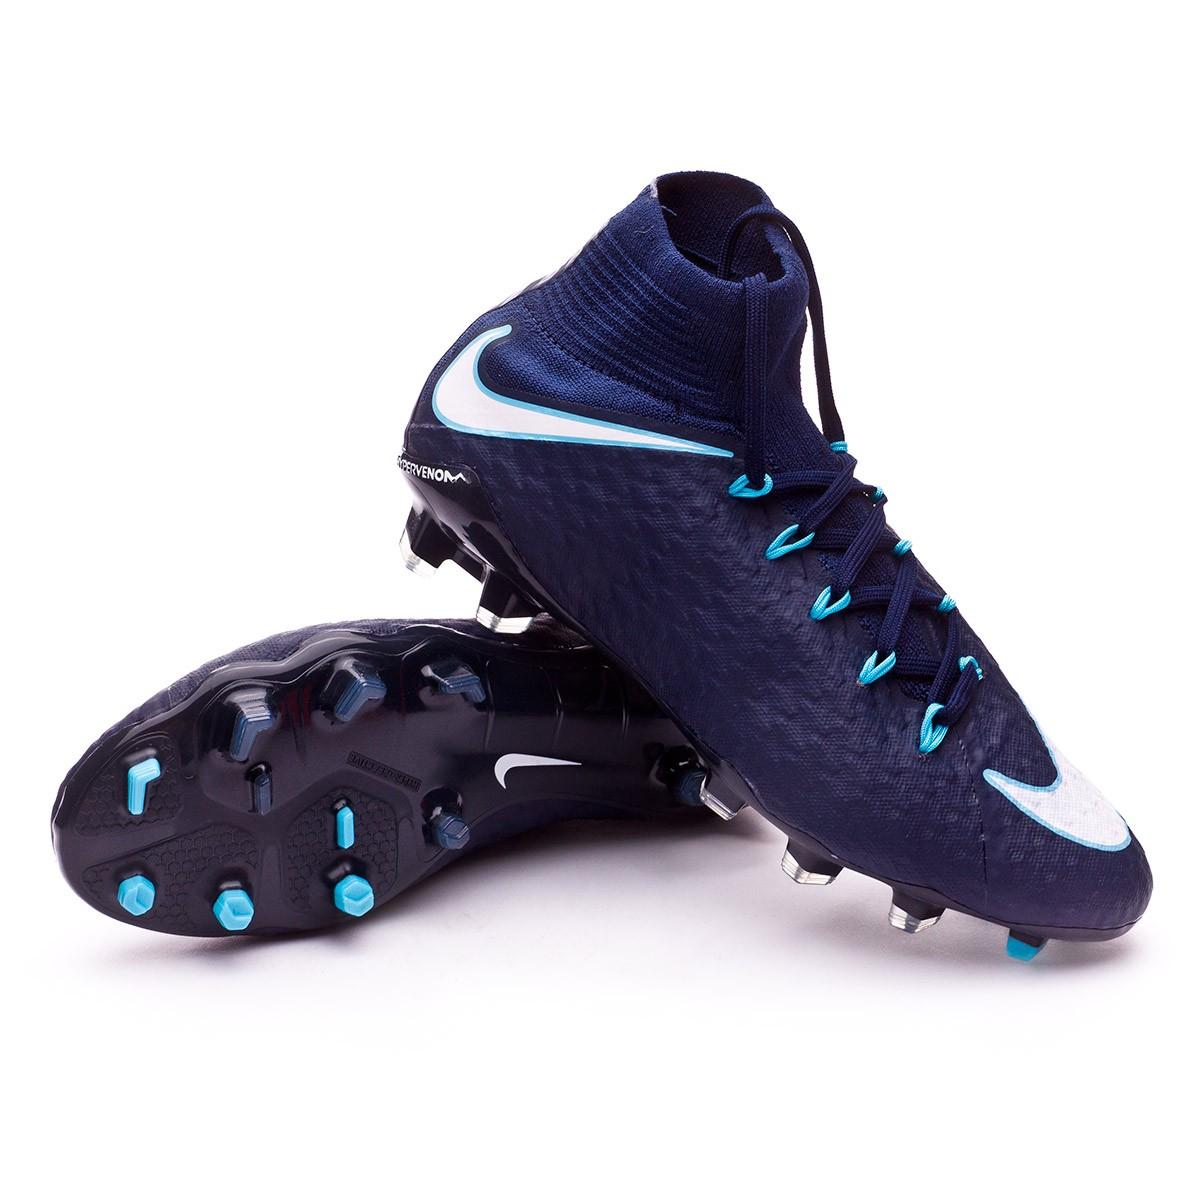 22b892de69a Football Boots Nike Hypervenom Phatal III DF FG Glacier blue-Gamma ...